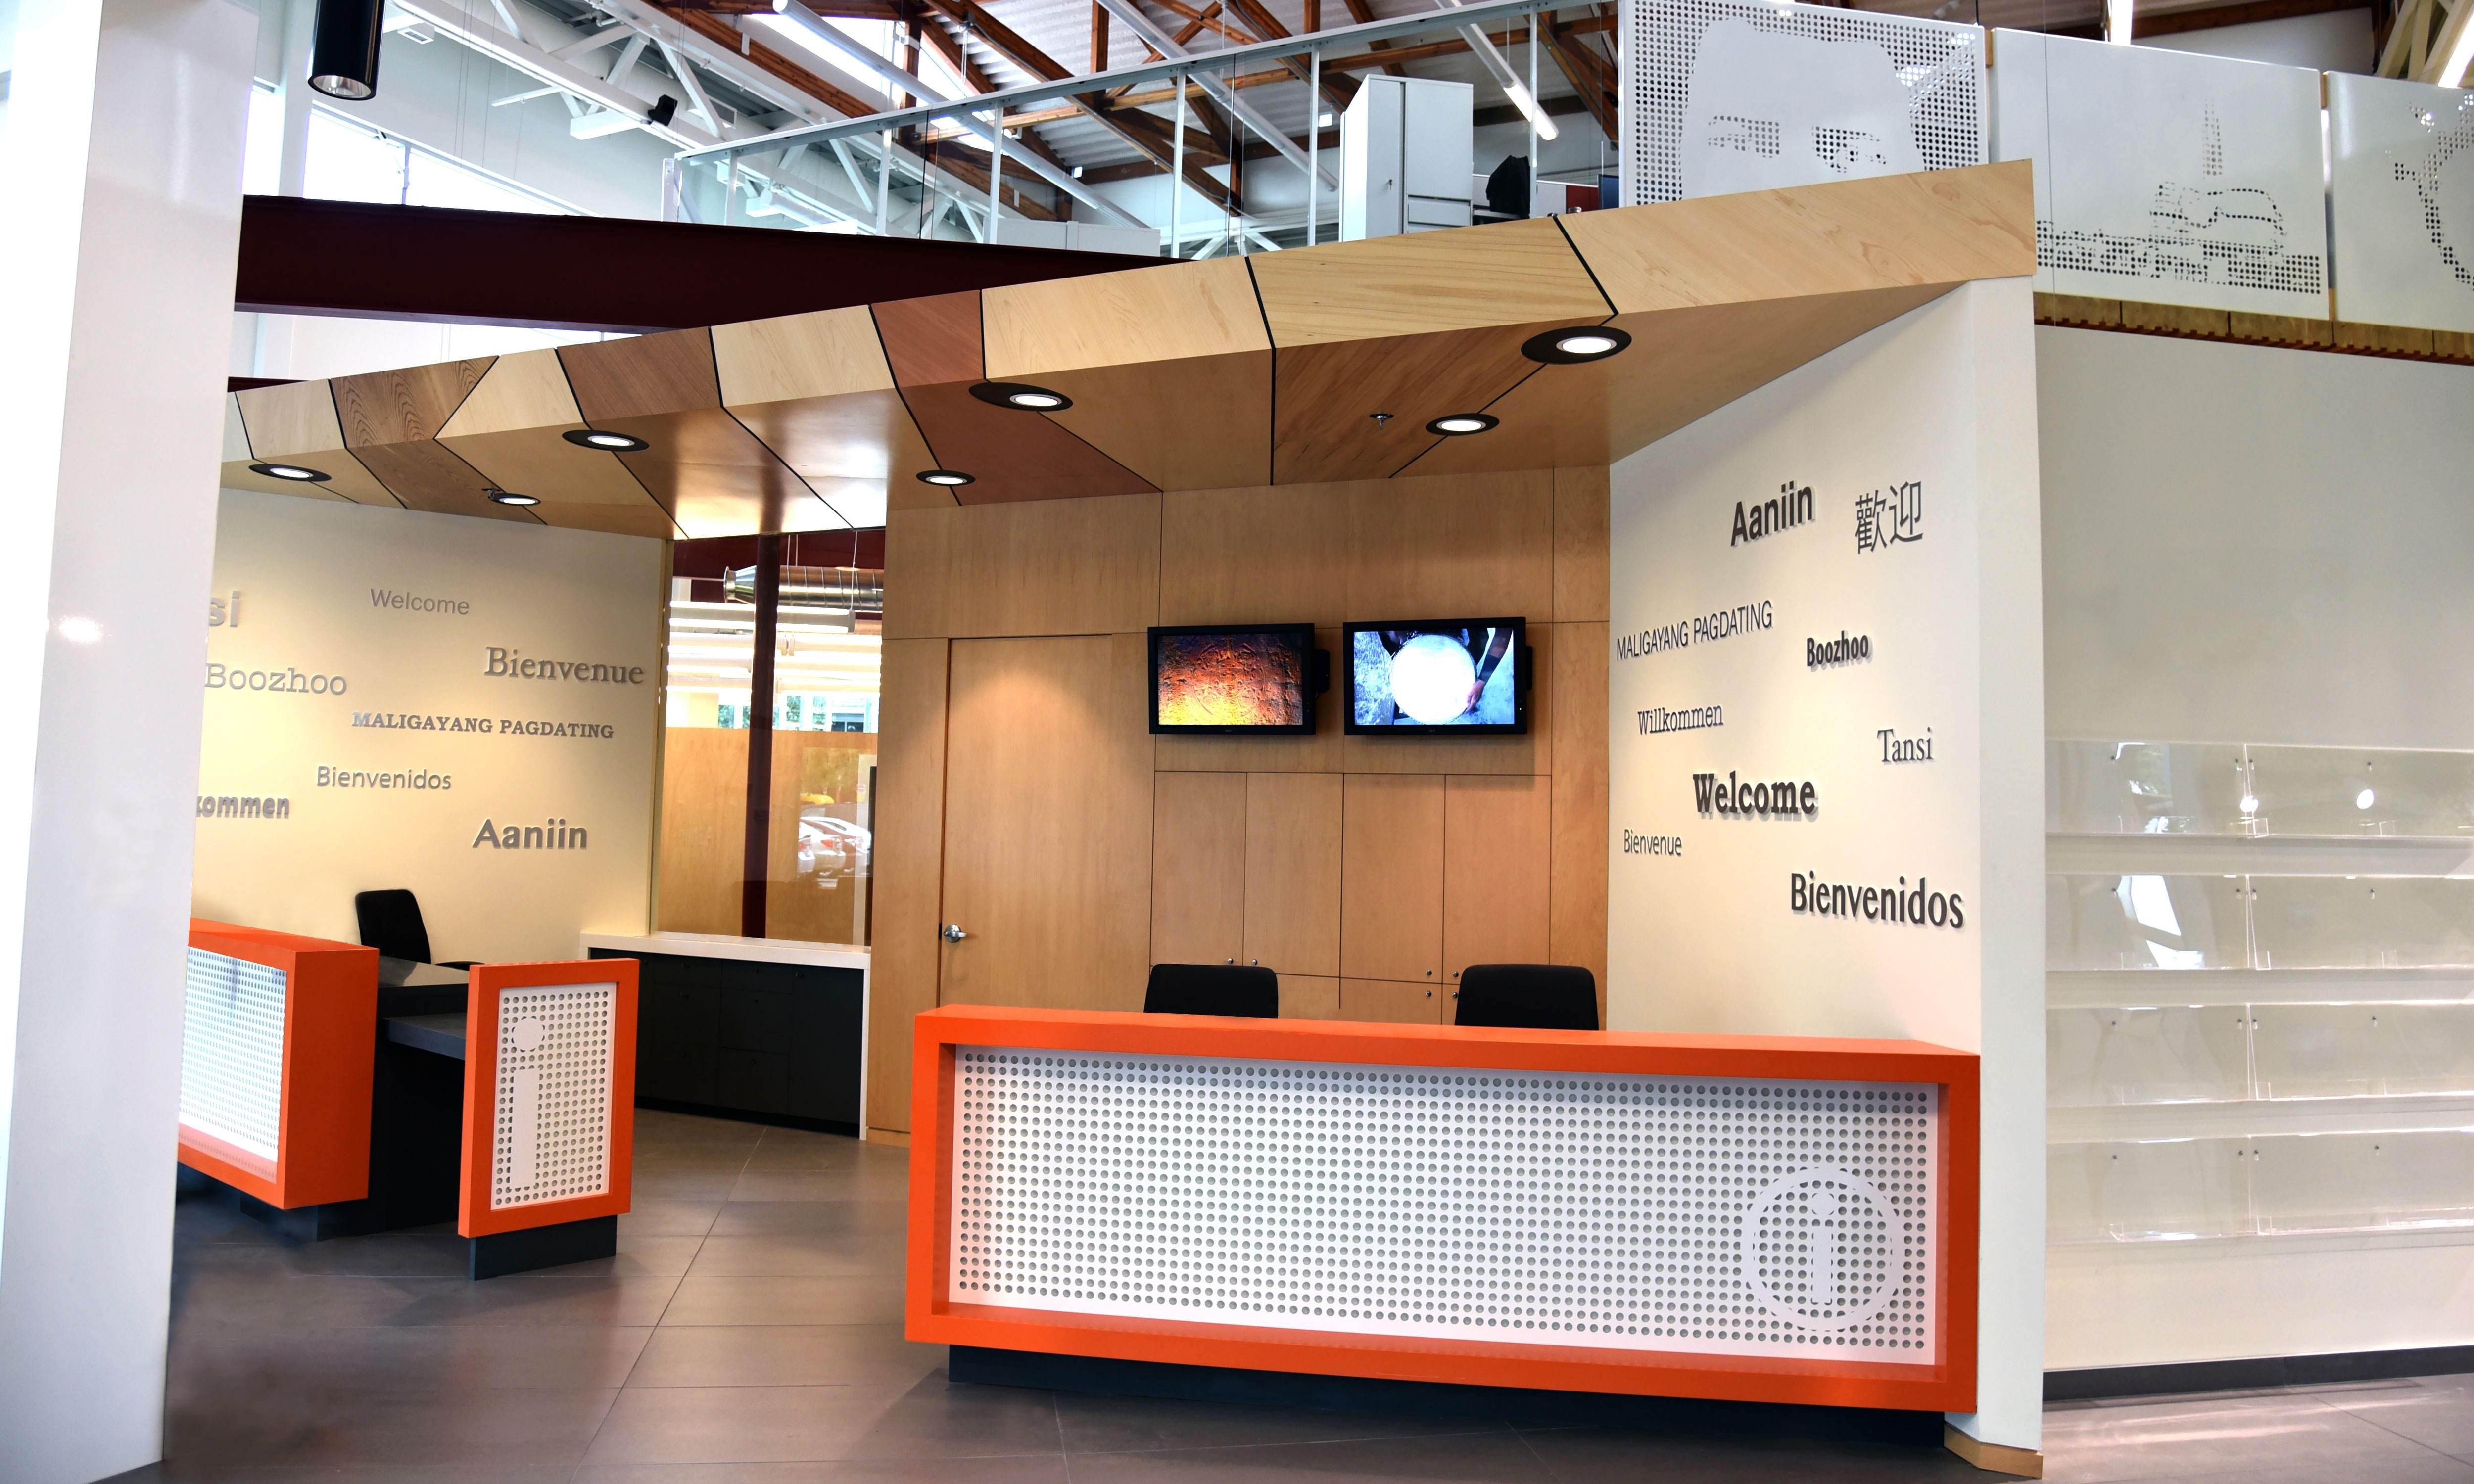 Travel Manitoba Visitor Information Centre U0026 Office   Sputnik Architecture